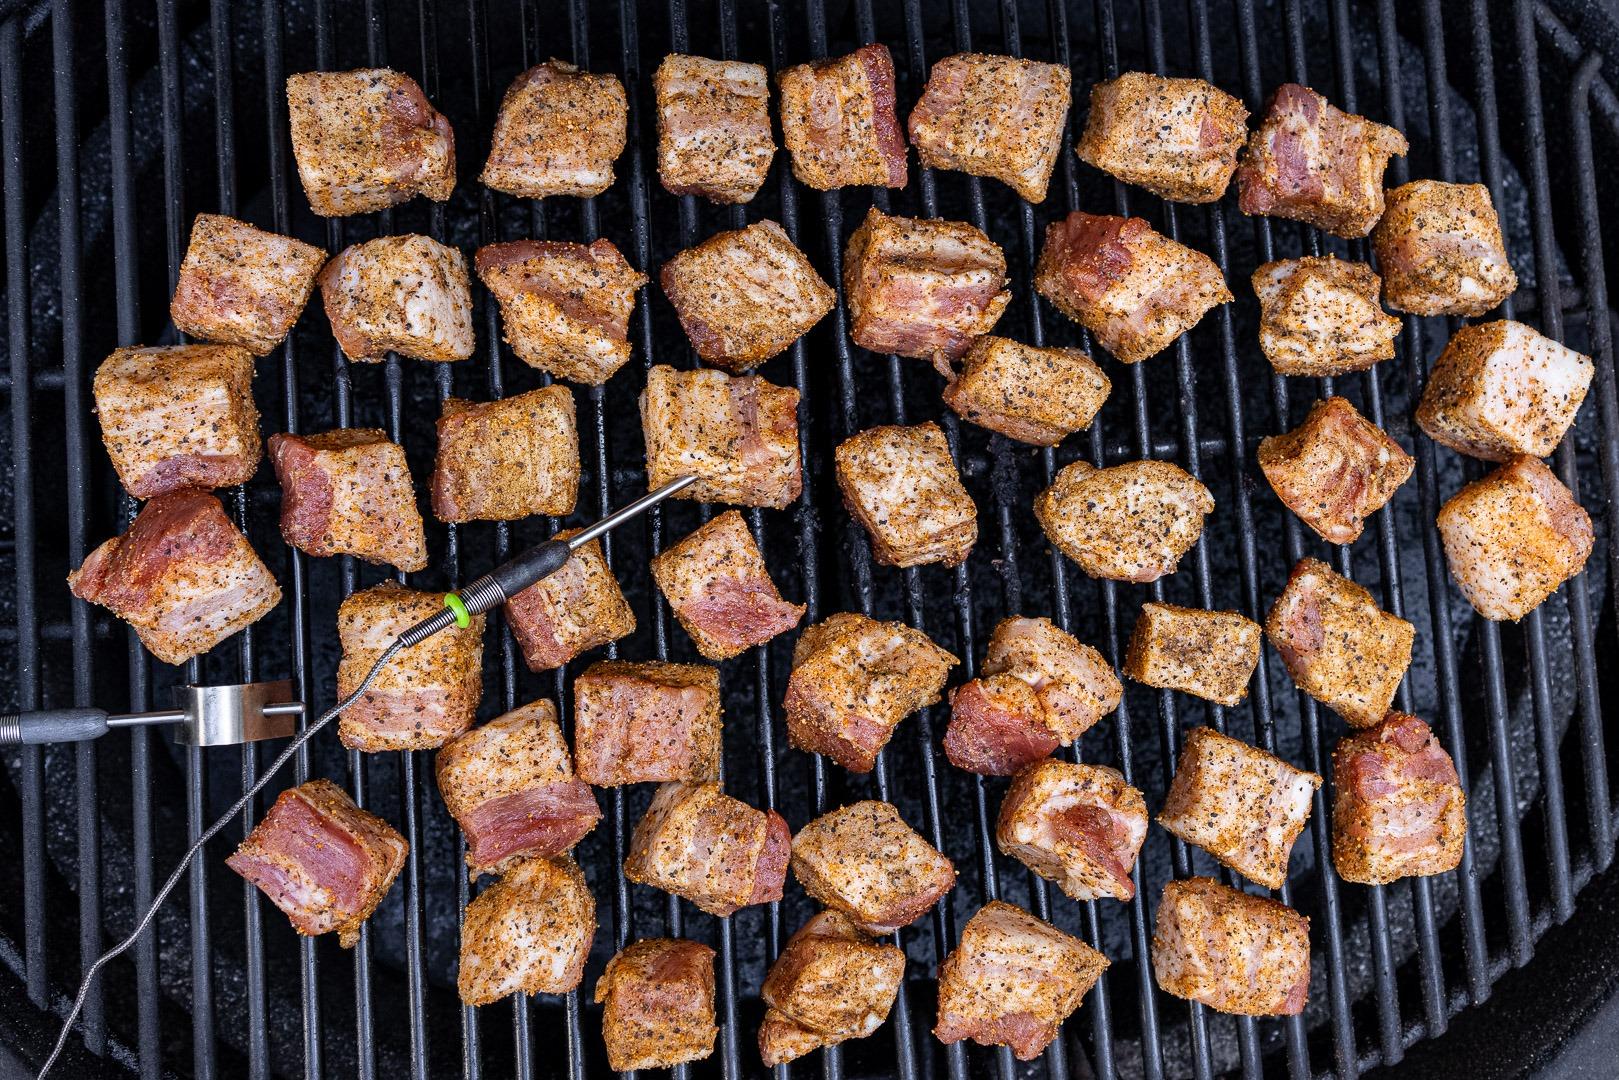 pork arranged on the smoker grate